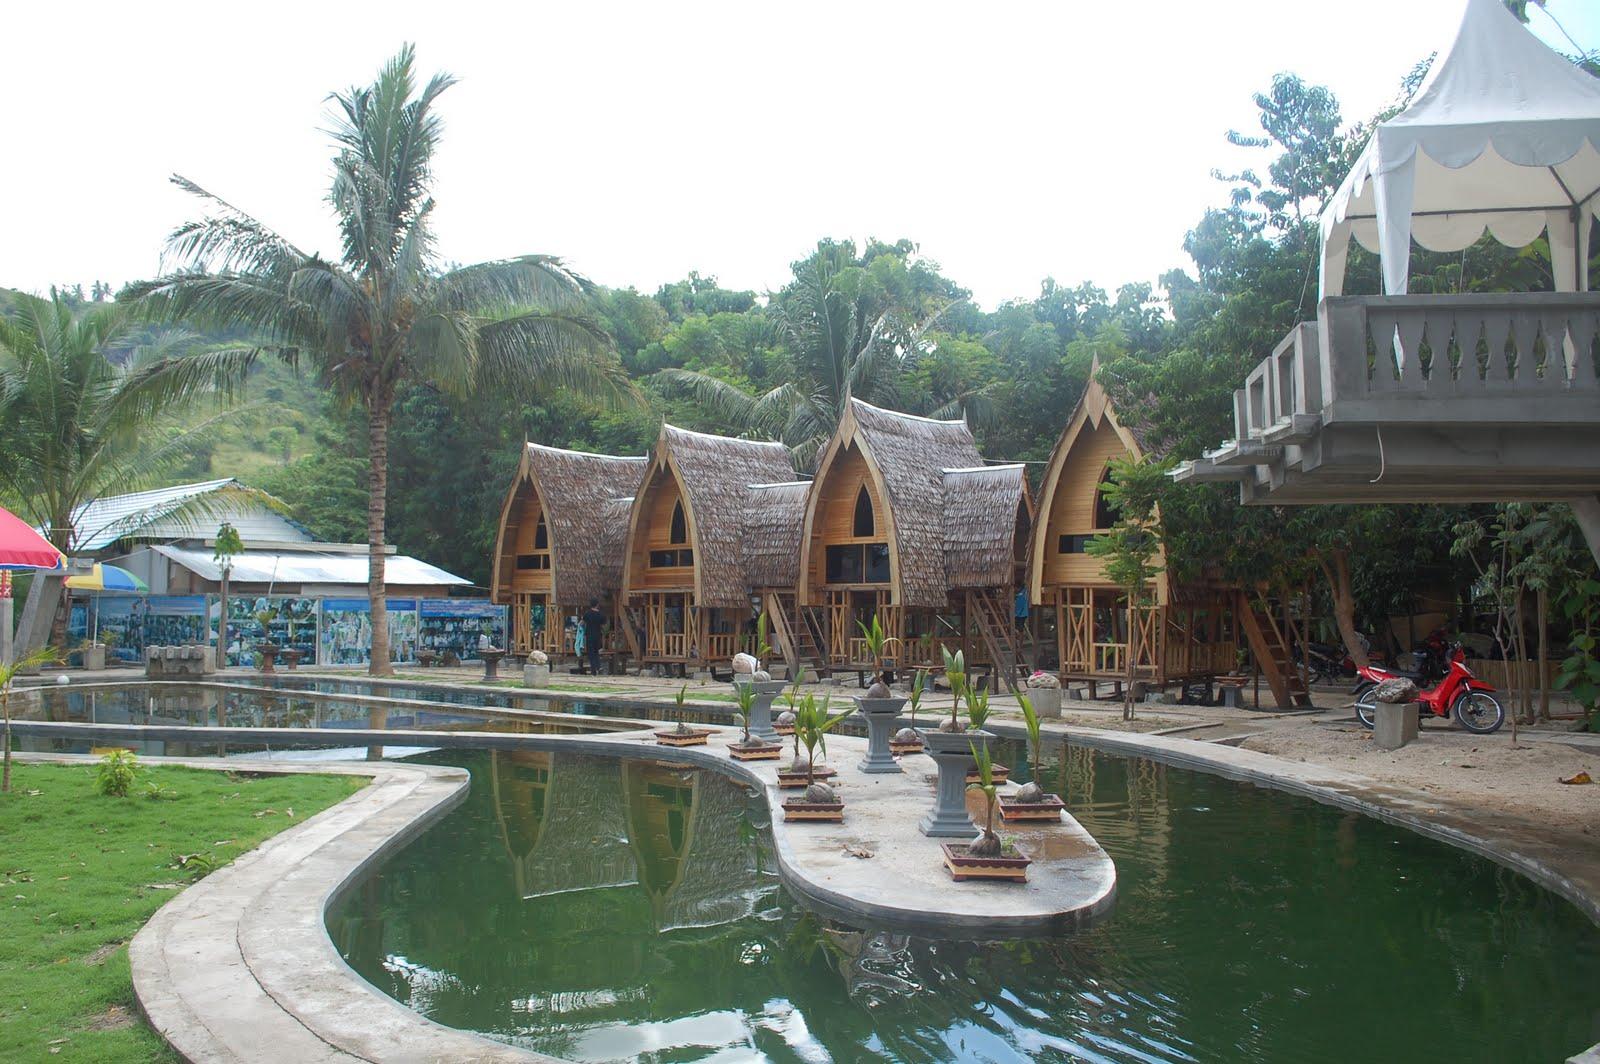 Wisata Kota Gorontalo Galeri Nusantara Kata Benteng Otanaha Kab